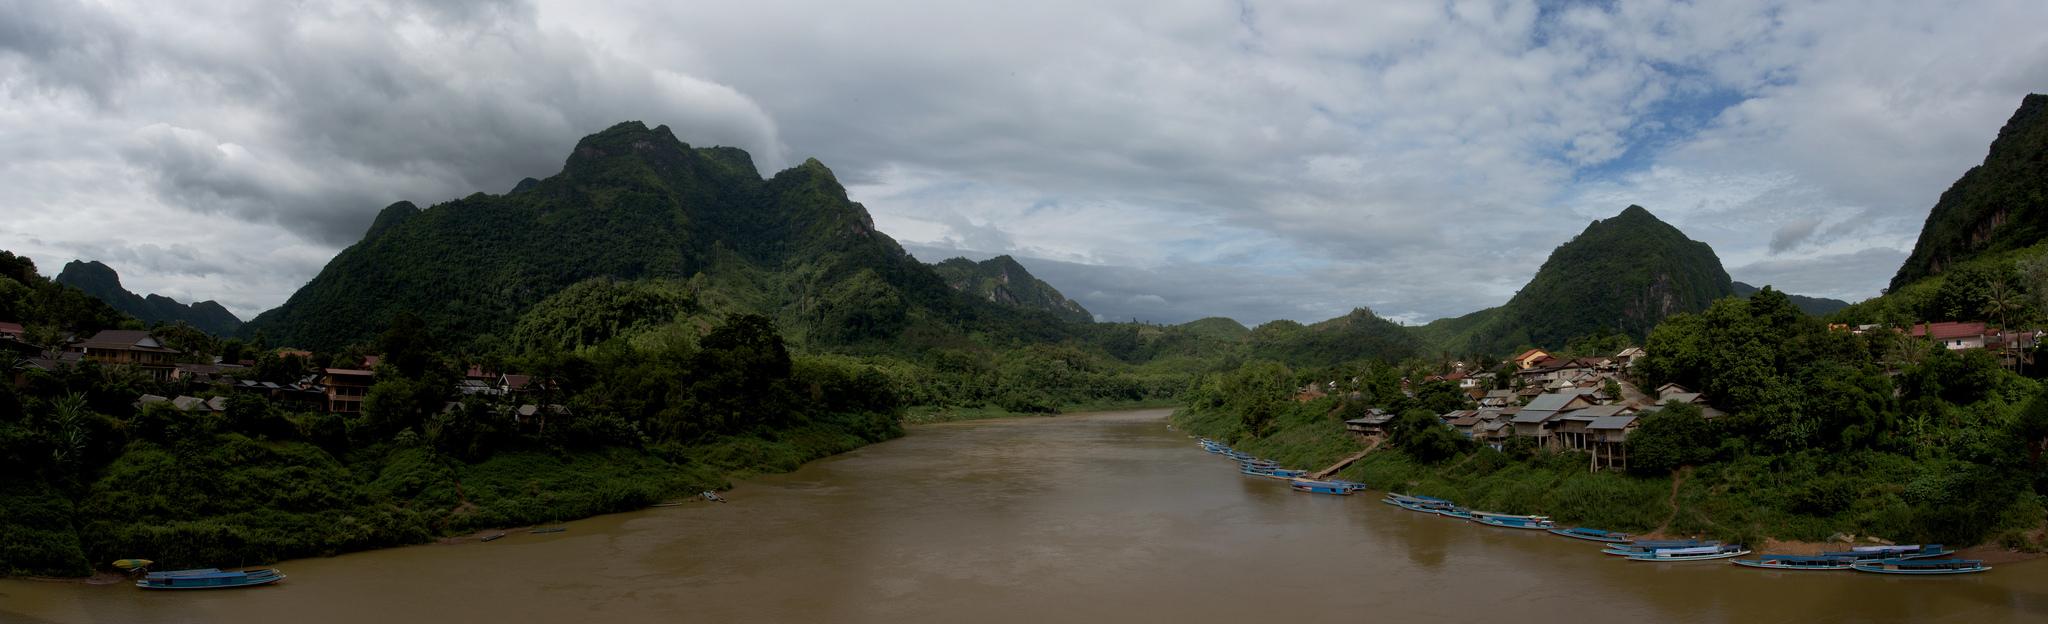 Nong Khiaw Laos panorama